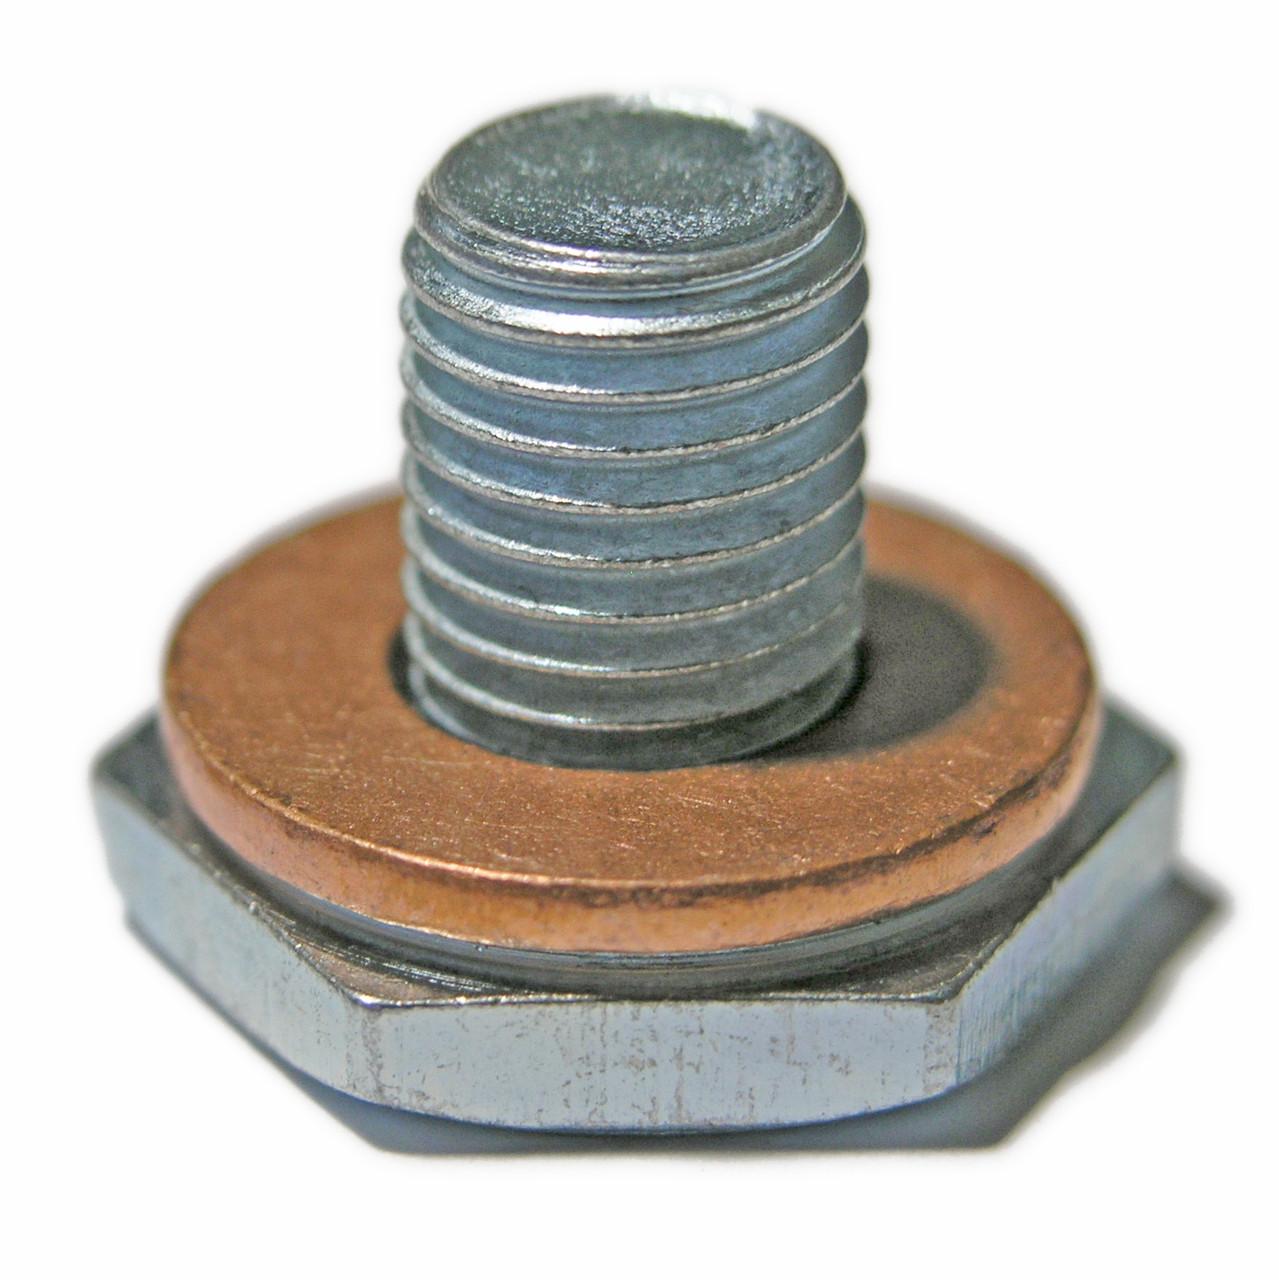 Fan Belt Alternator MEYLE V-Ribbed Belt 10PK1620 1620mm 10 Ribs